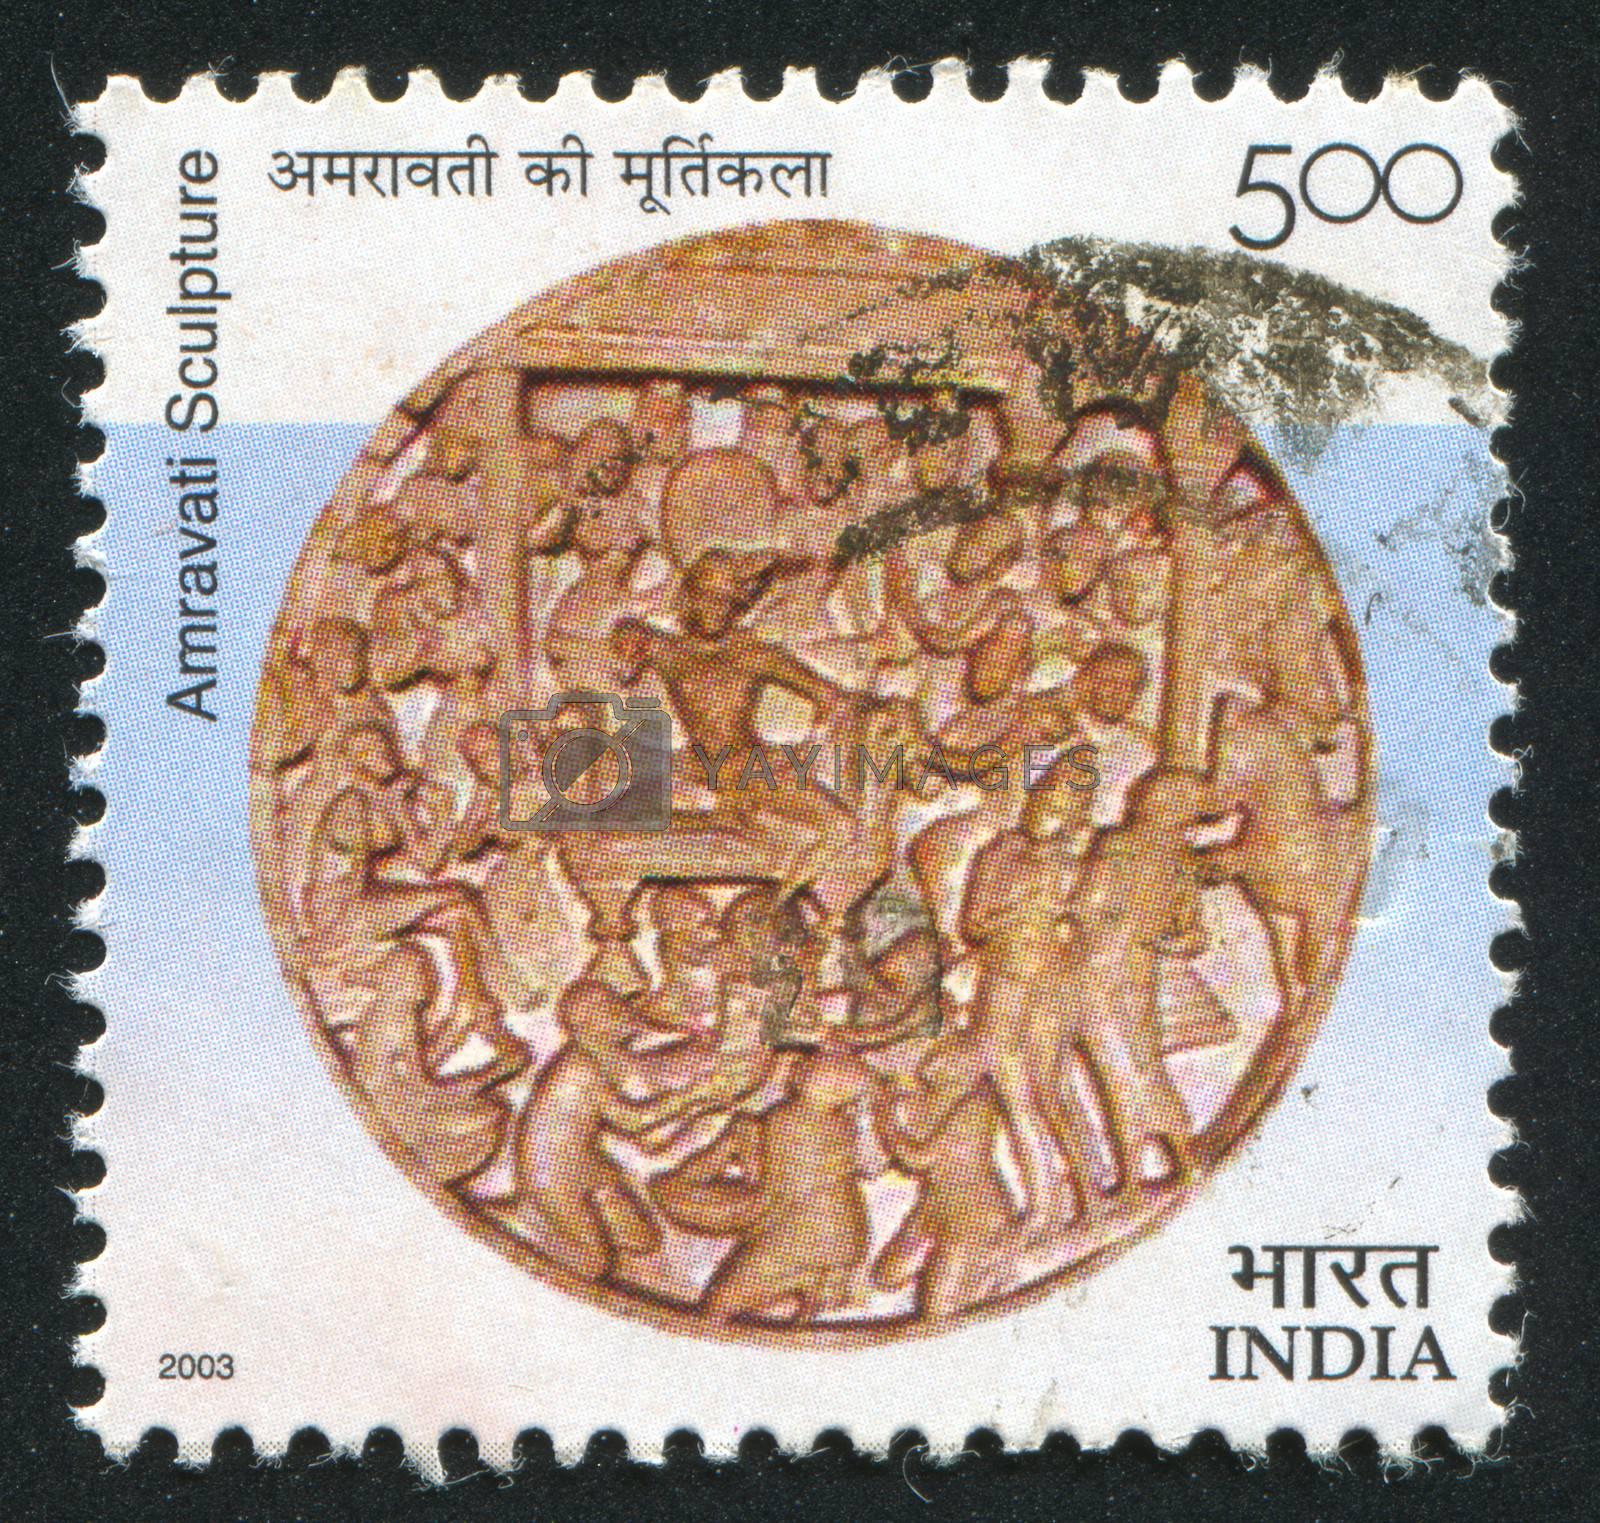 INDIA - CIRCA 2003: stamp printed by India, shows Amravati sculpture, circa 2003